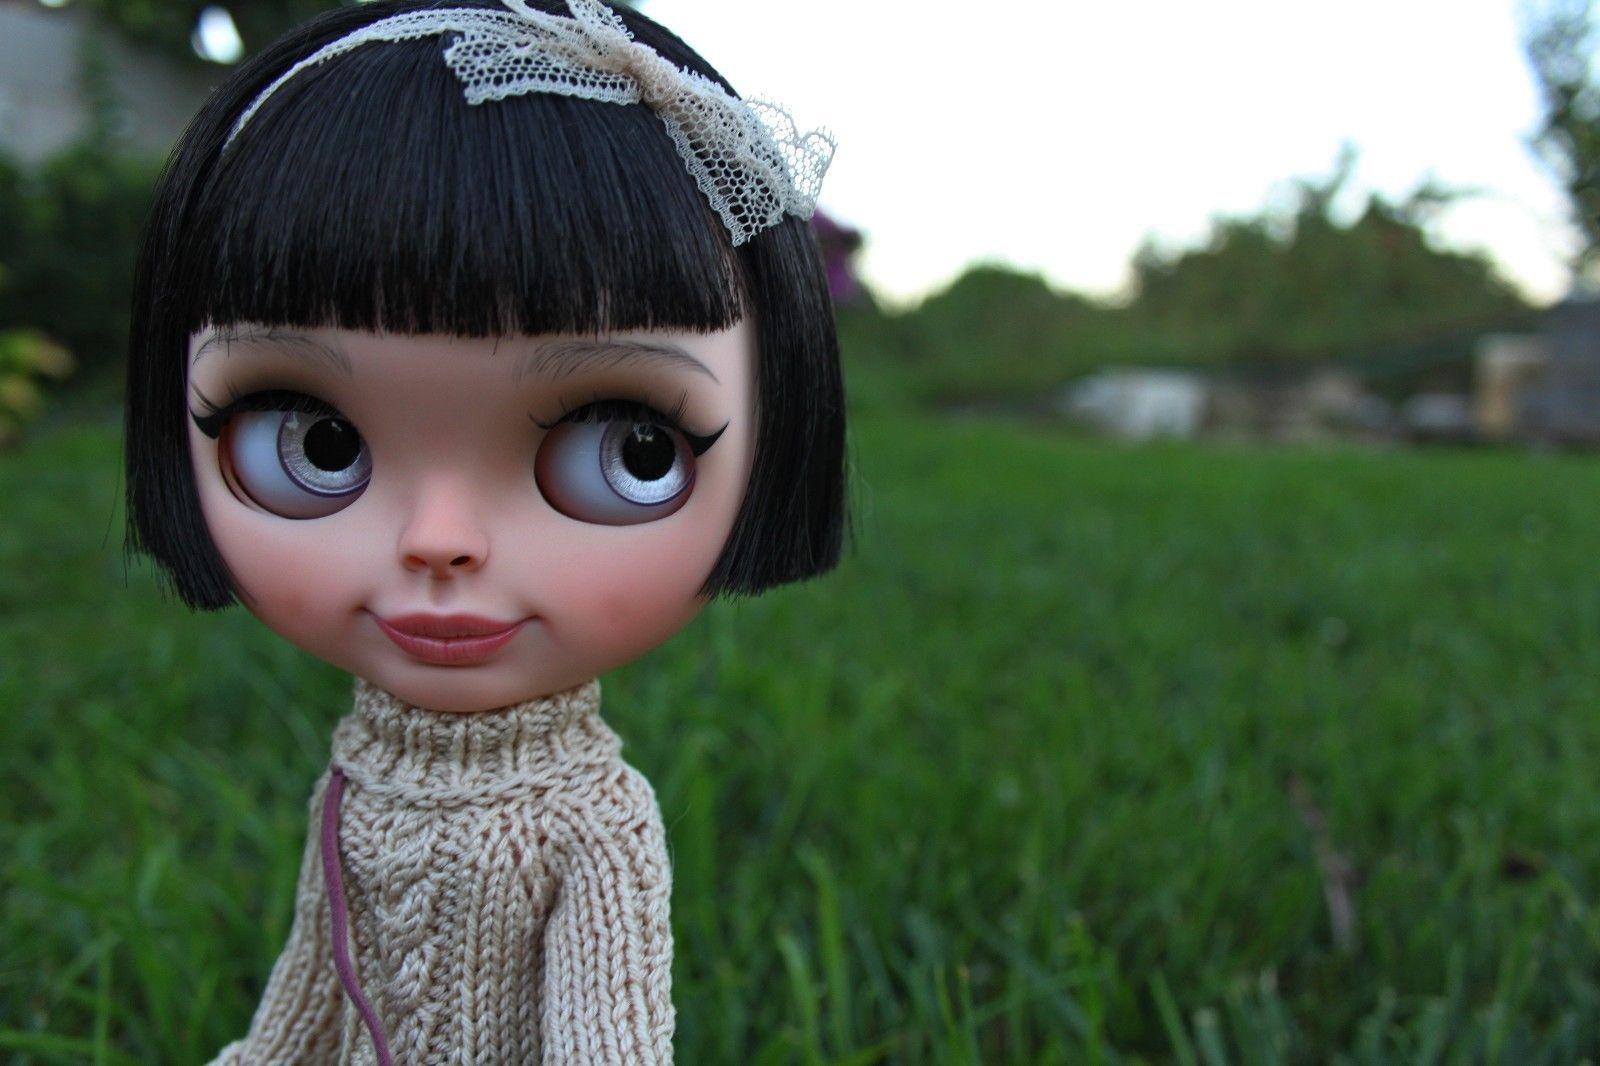 http://www.ebay.com/itm/OOAK-Custom-original-Blythe-doll-Check-it-Out-by-Olga-Kamenetskaya-/232068281127?hash=item360858f327:g:g8wAAOSwgZ1Xwfsh